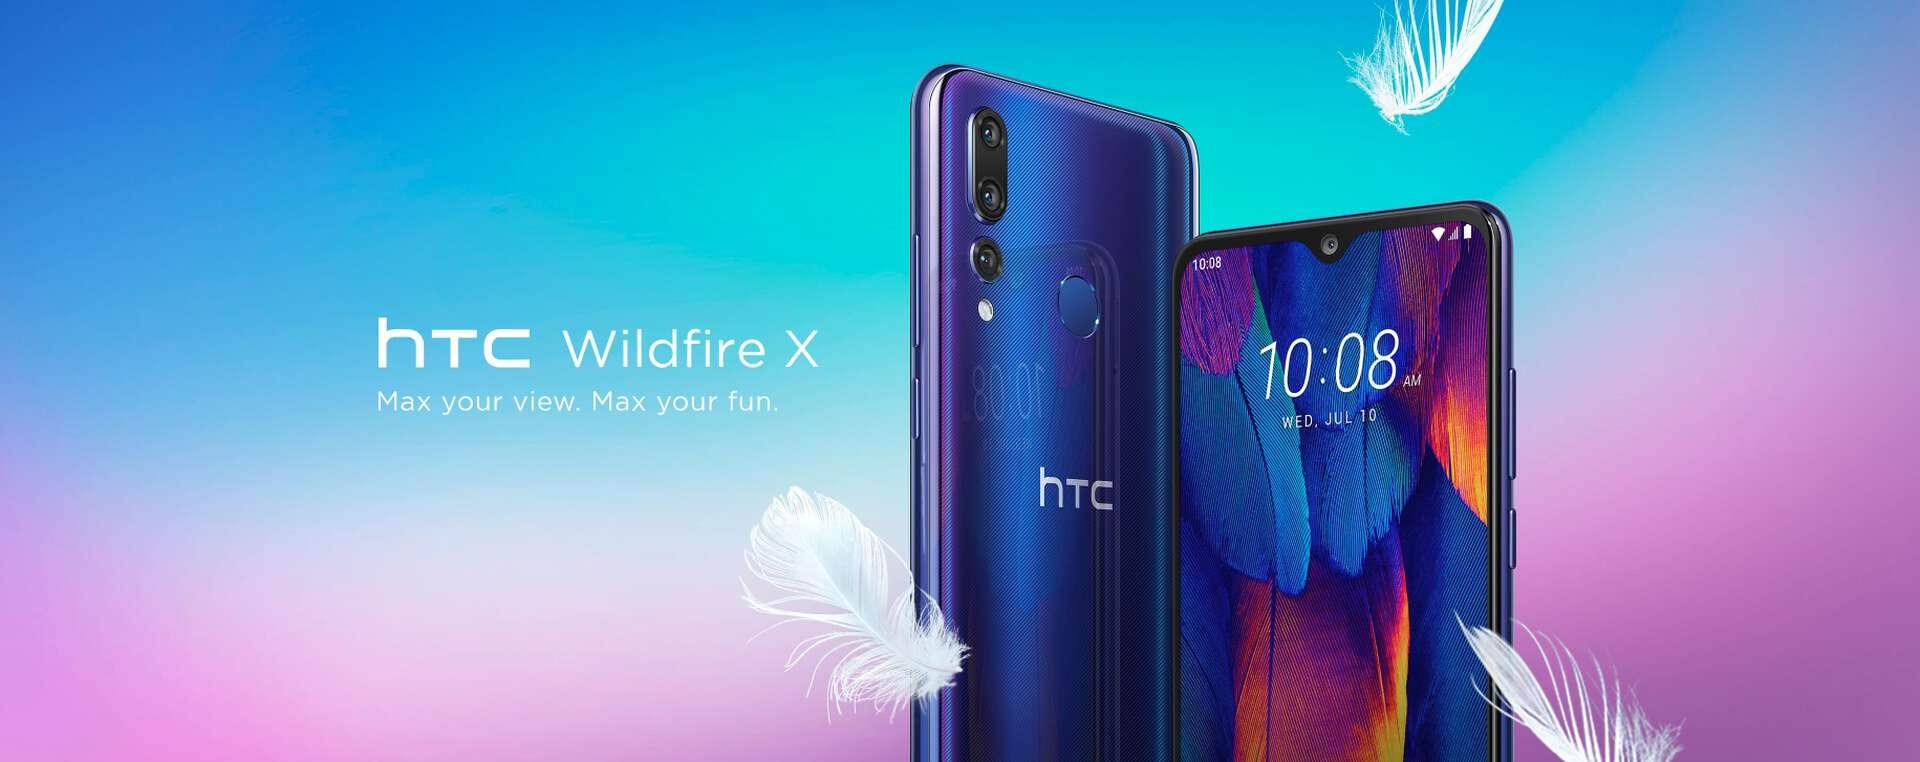 HTC Wildfire X image 5